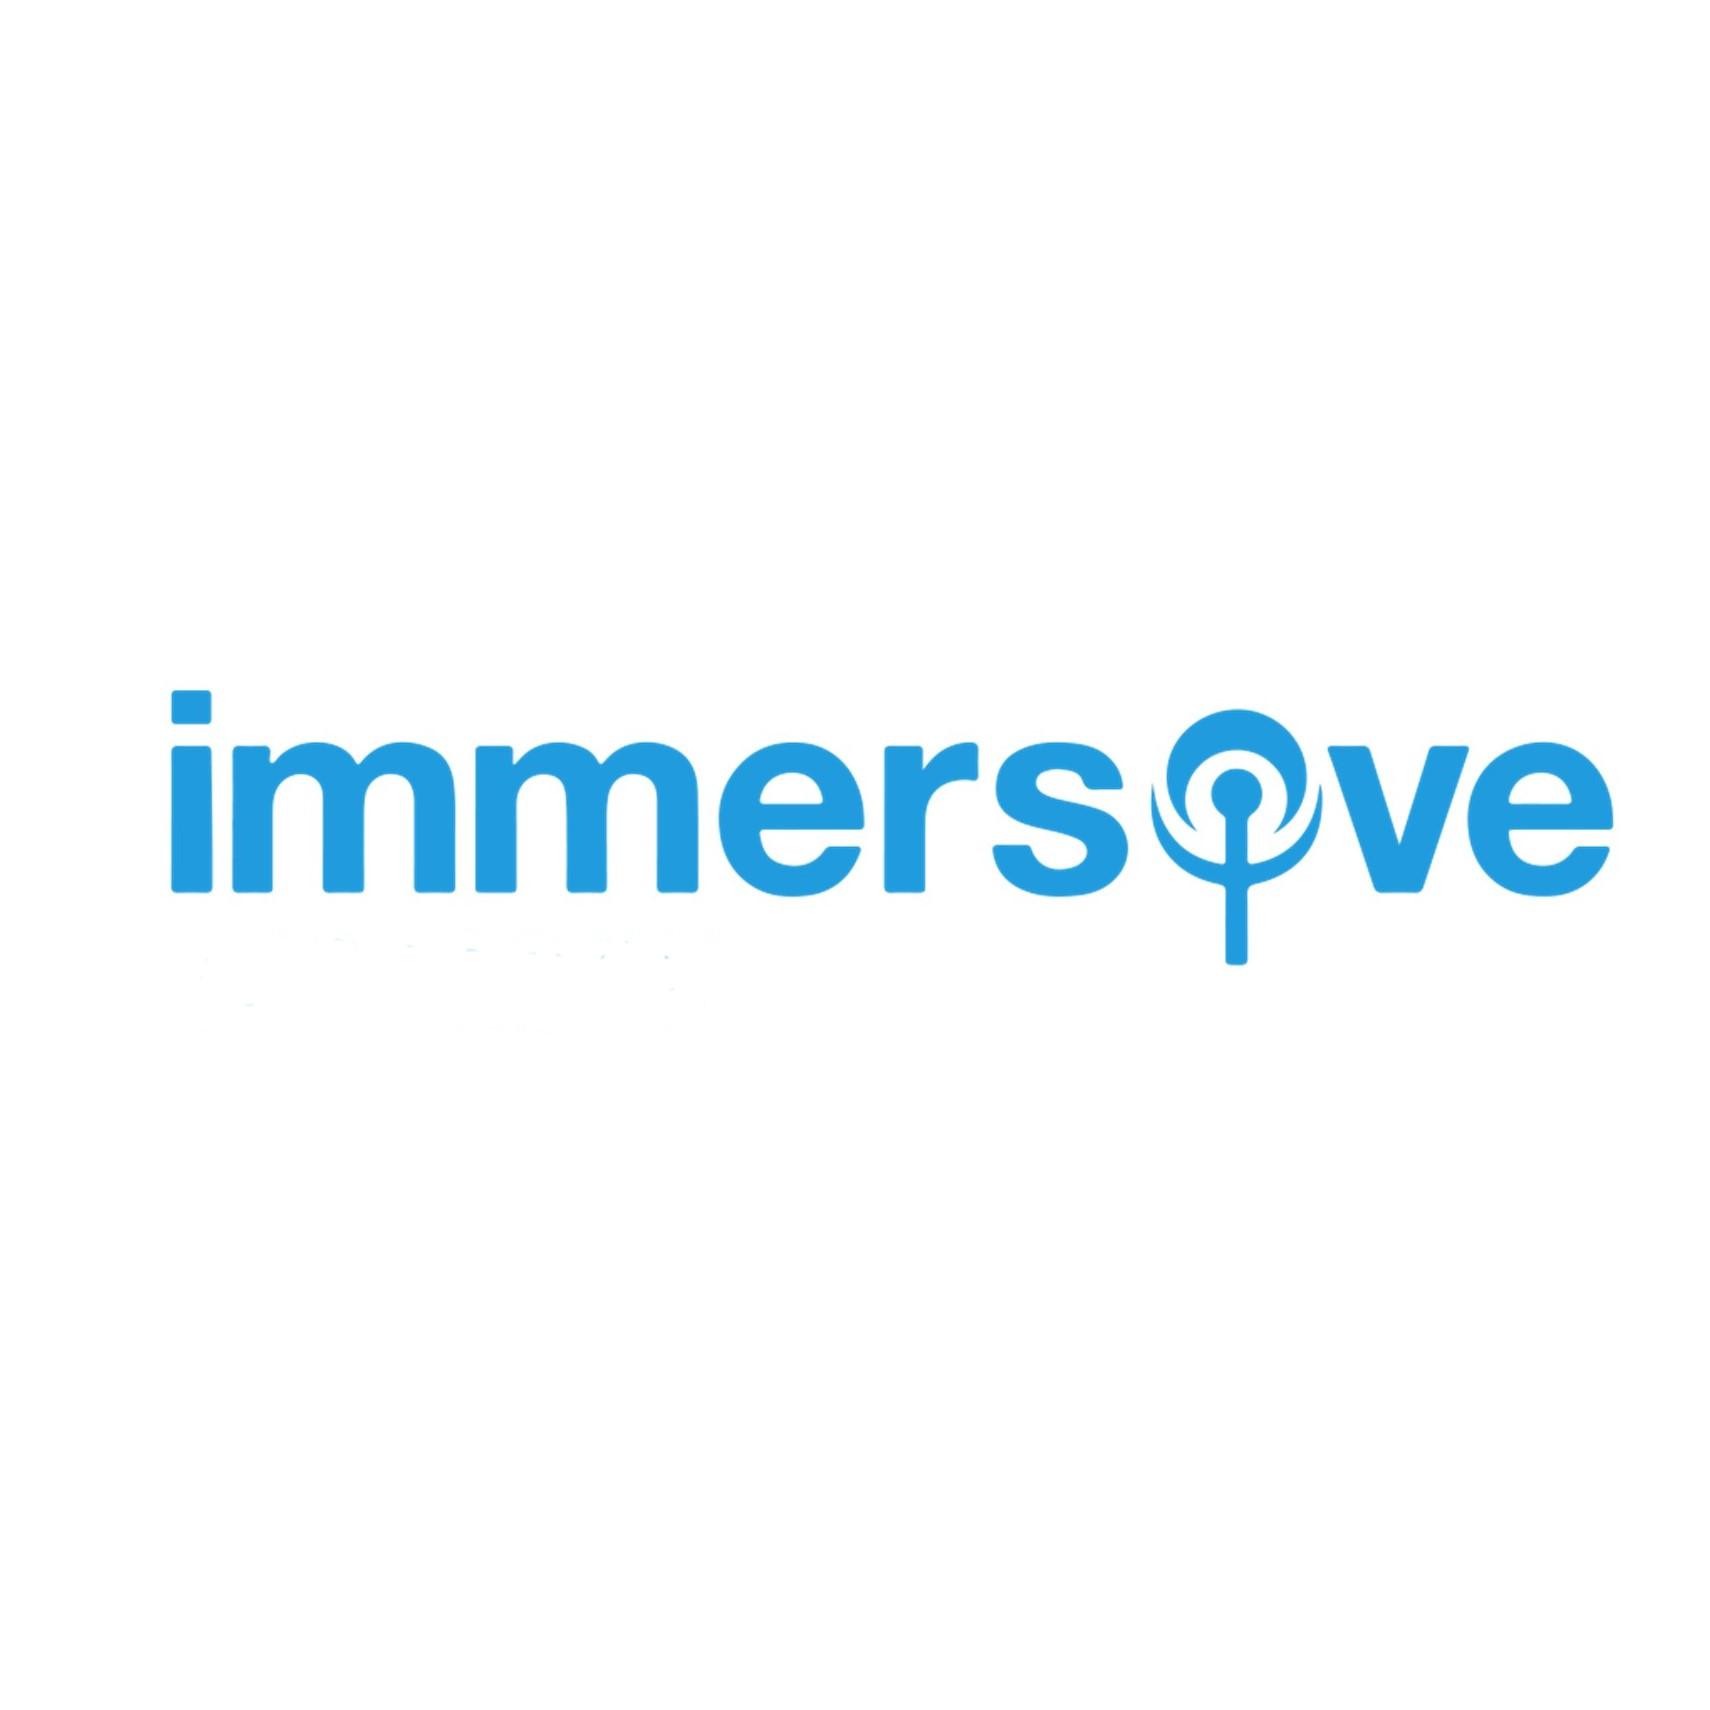 Immersyve, Inc.